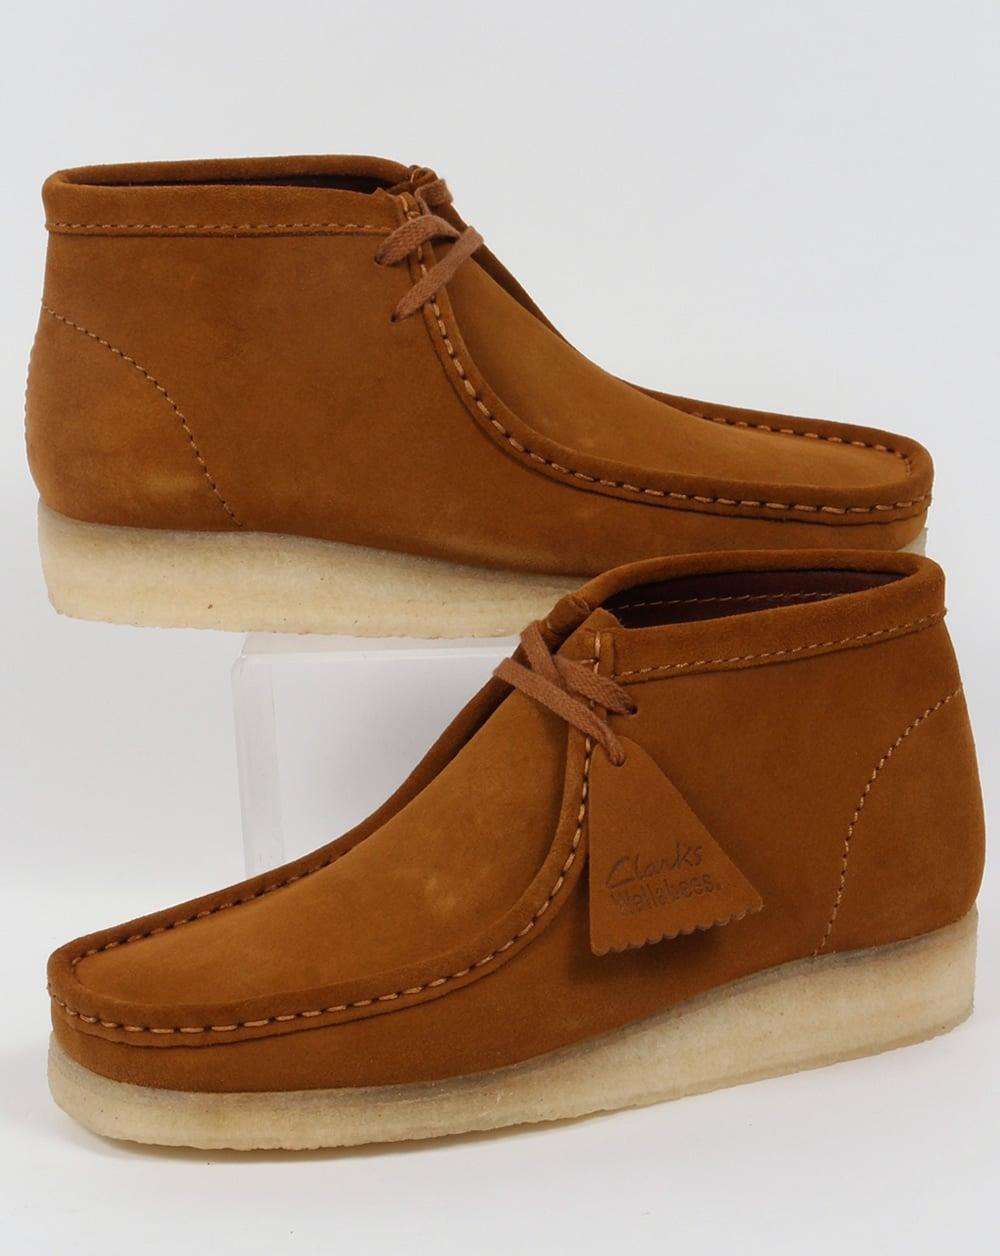 Cheap Clarks Mens Shoes Uk